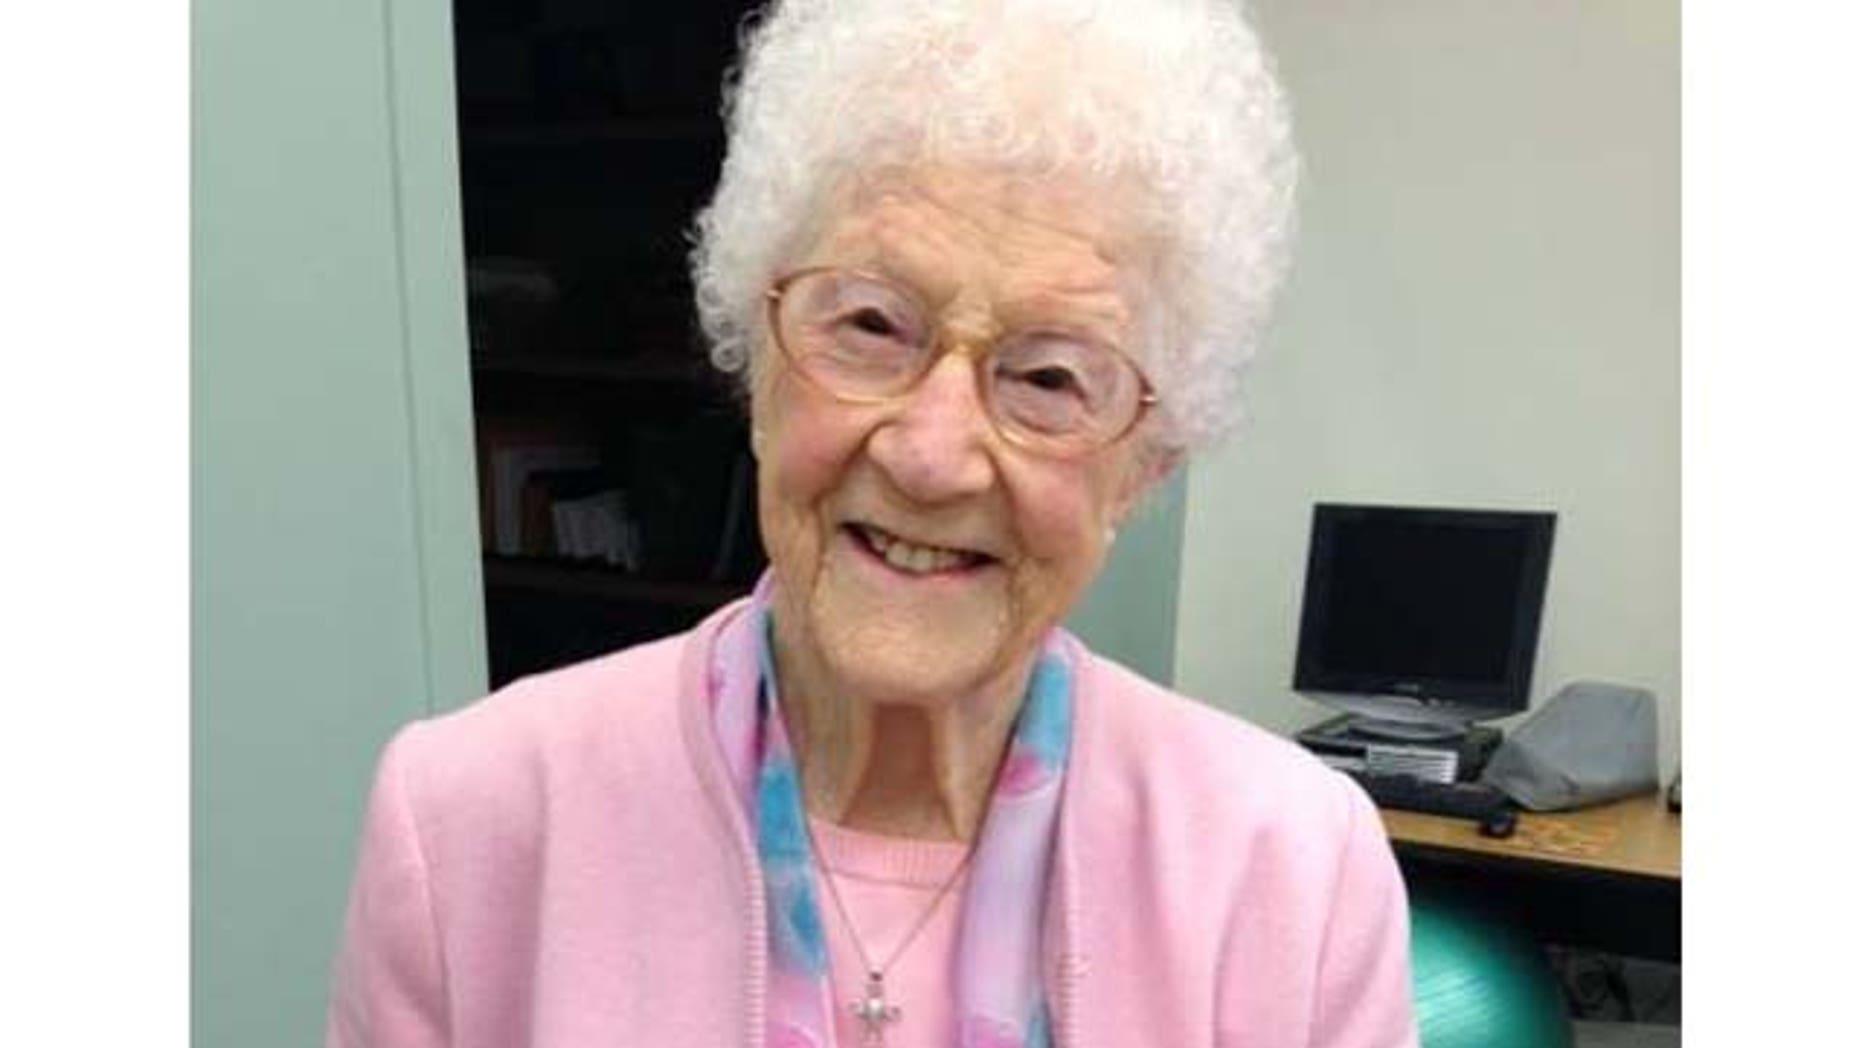 Edythe Kirchmaier, the oldest registered Facebook user, celebrated her 107th birthday on Thursday in Santa Barbara, Calif.